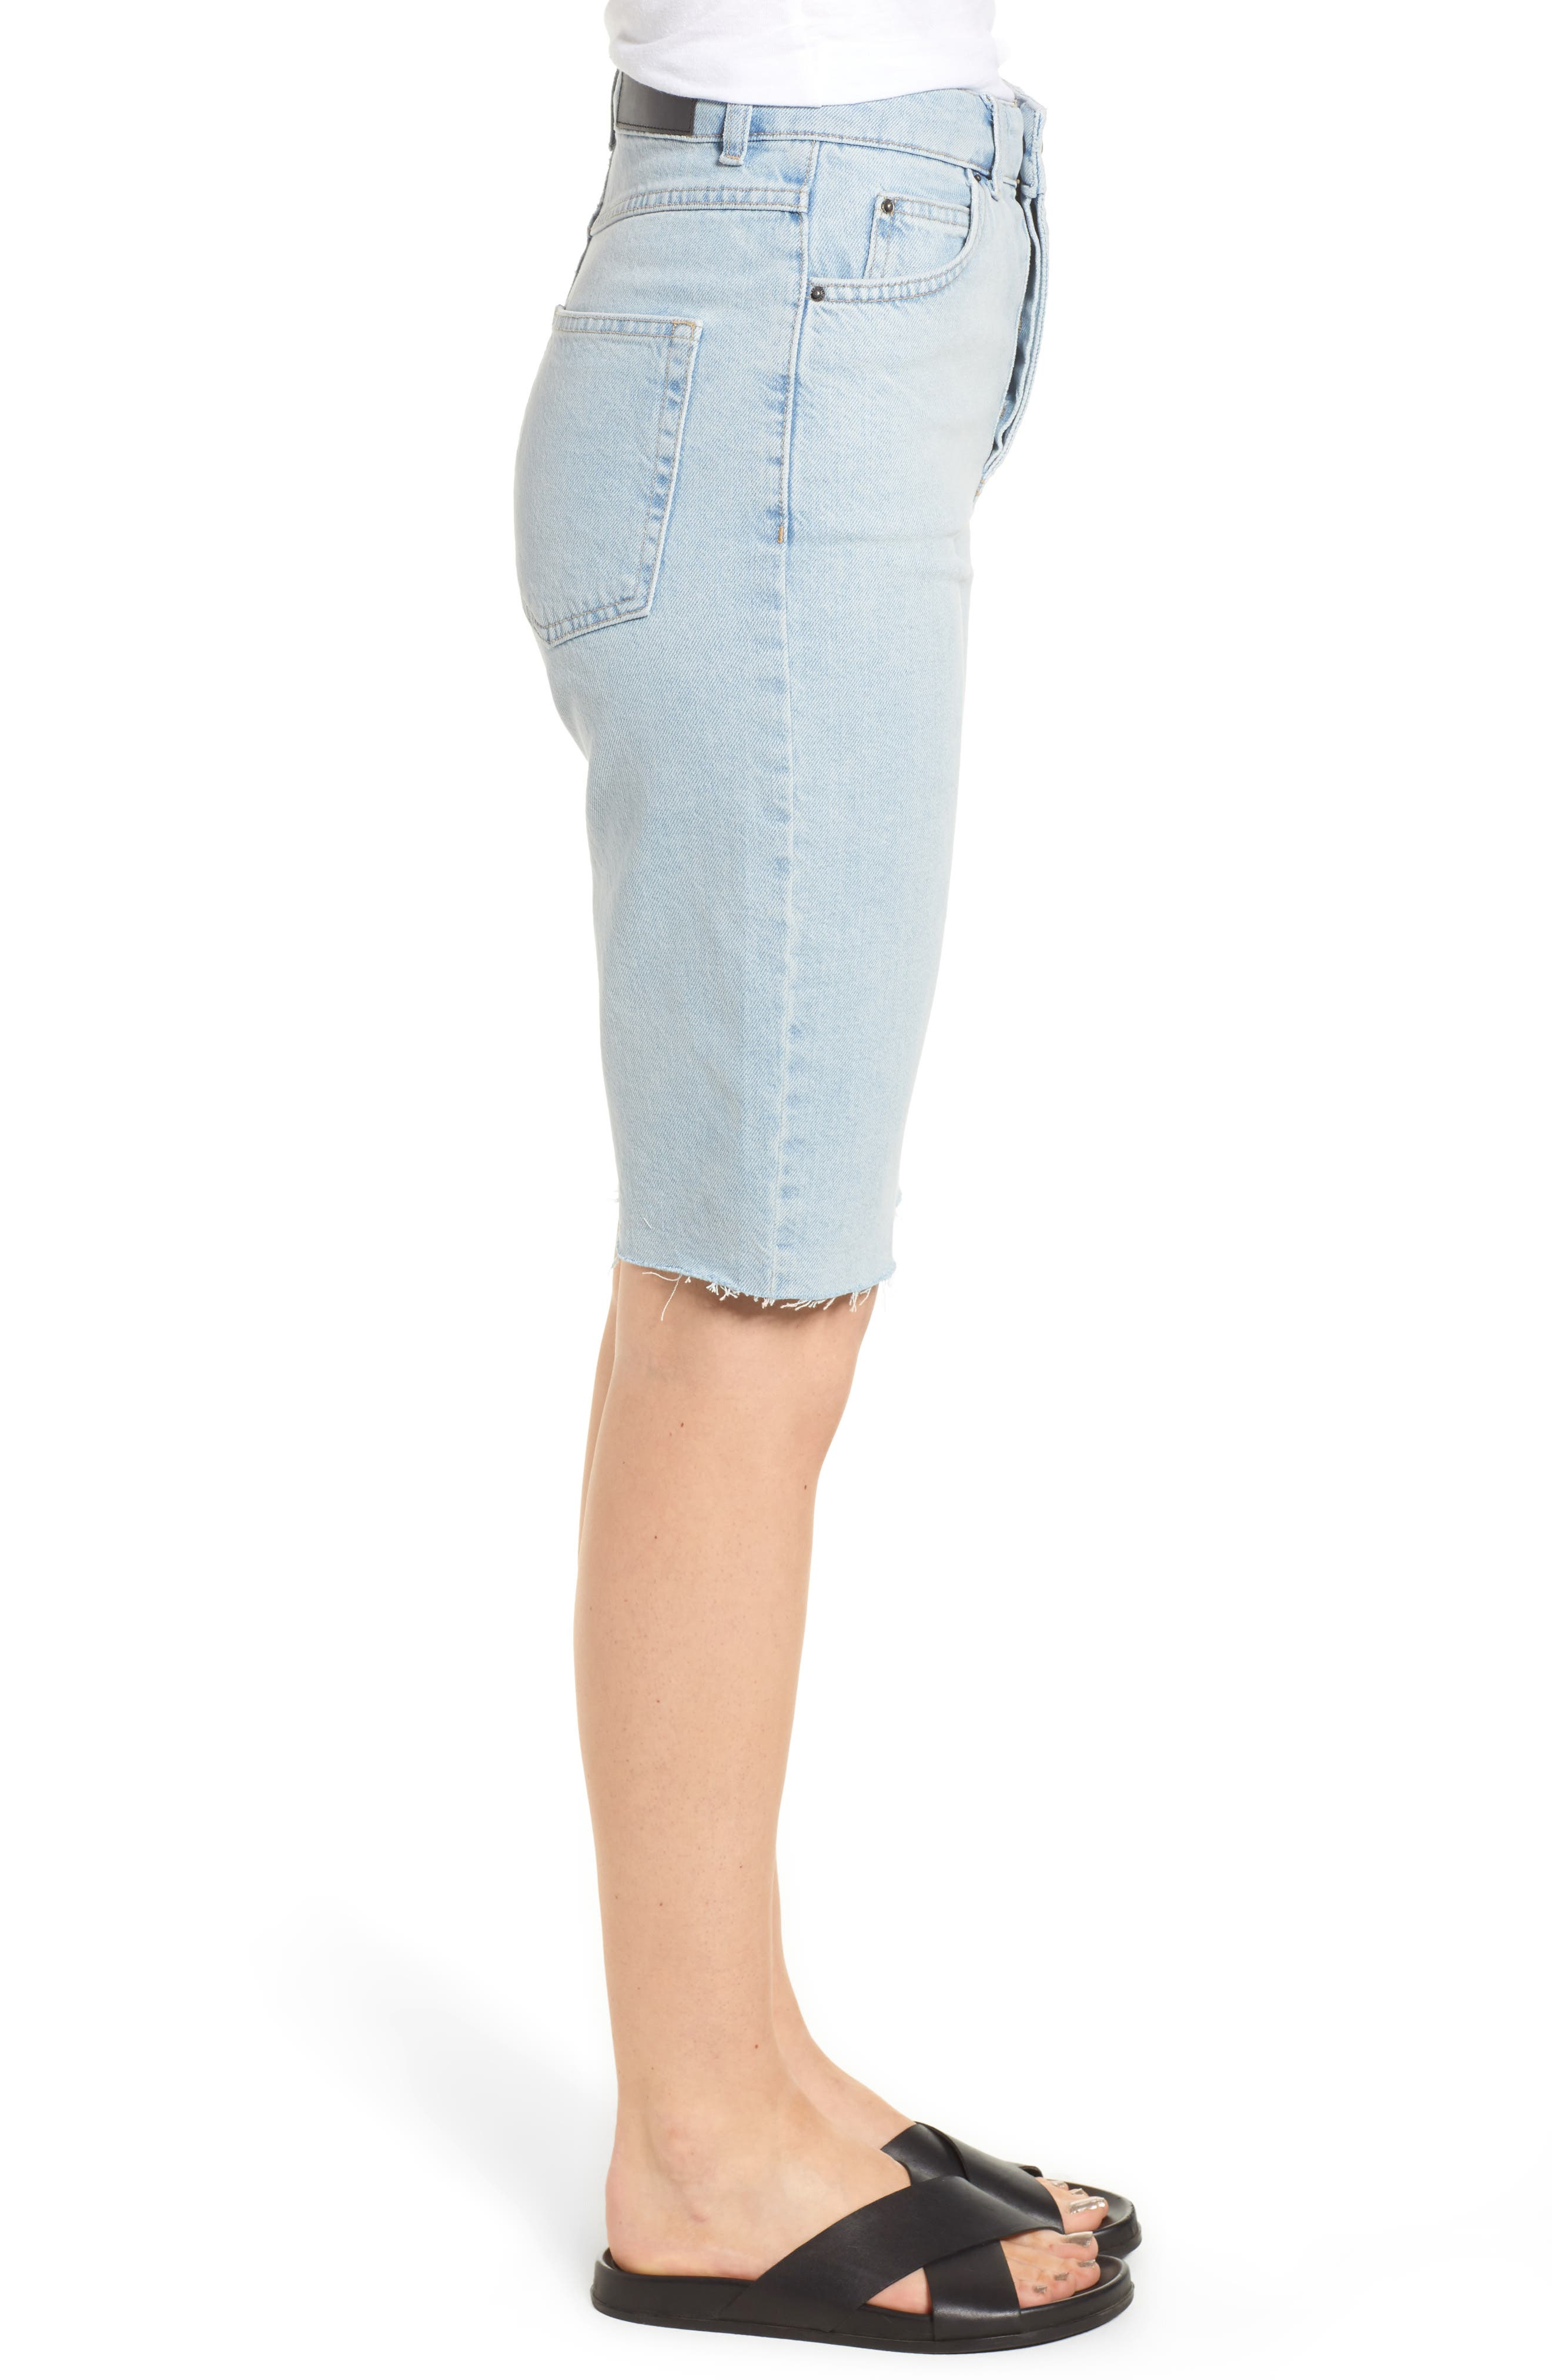 Bleach Denim Board Shorts,                             Alternate thumbnail 3, color,                             420